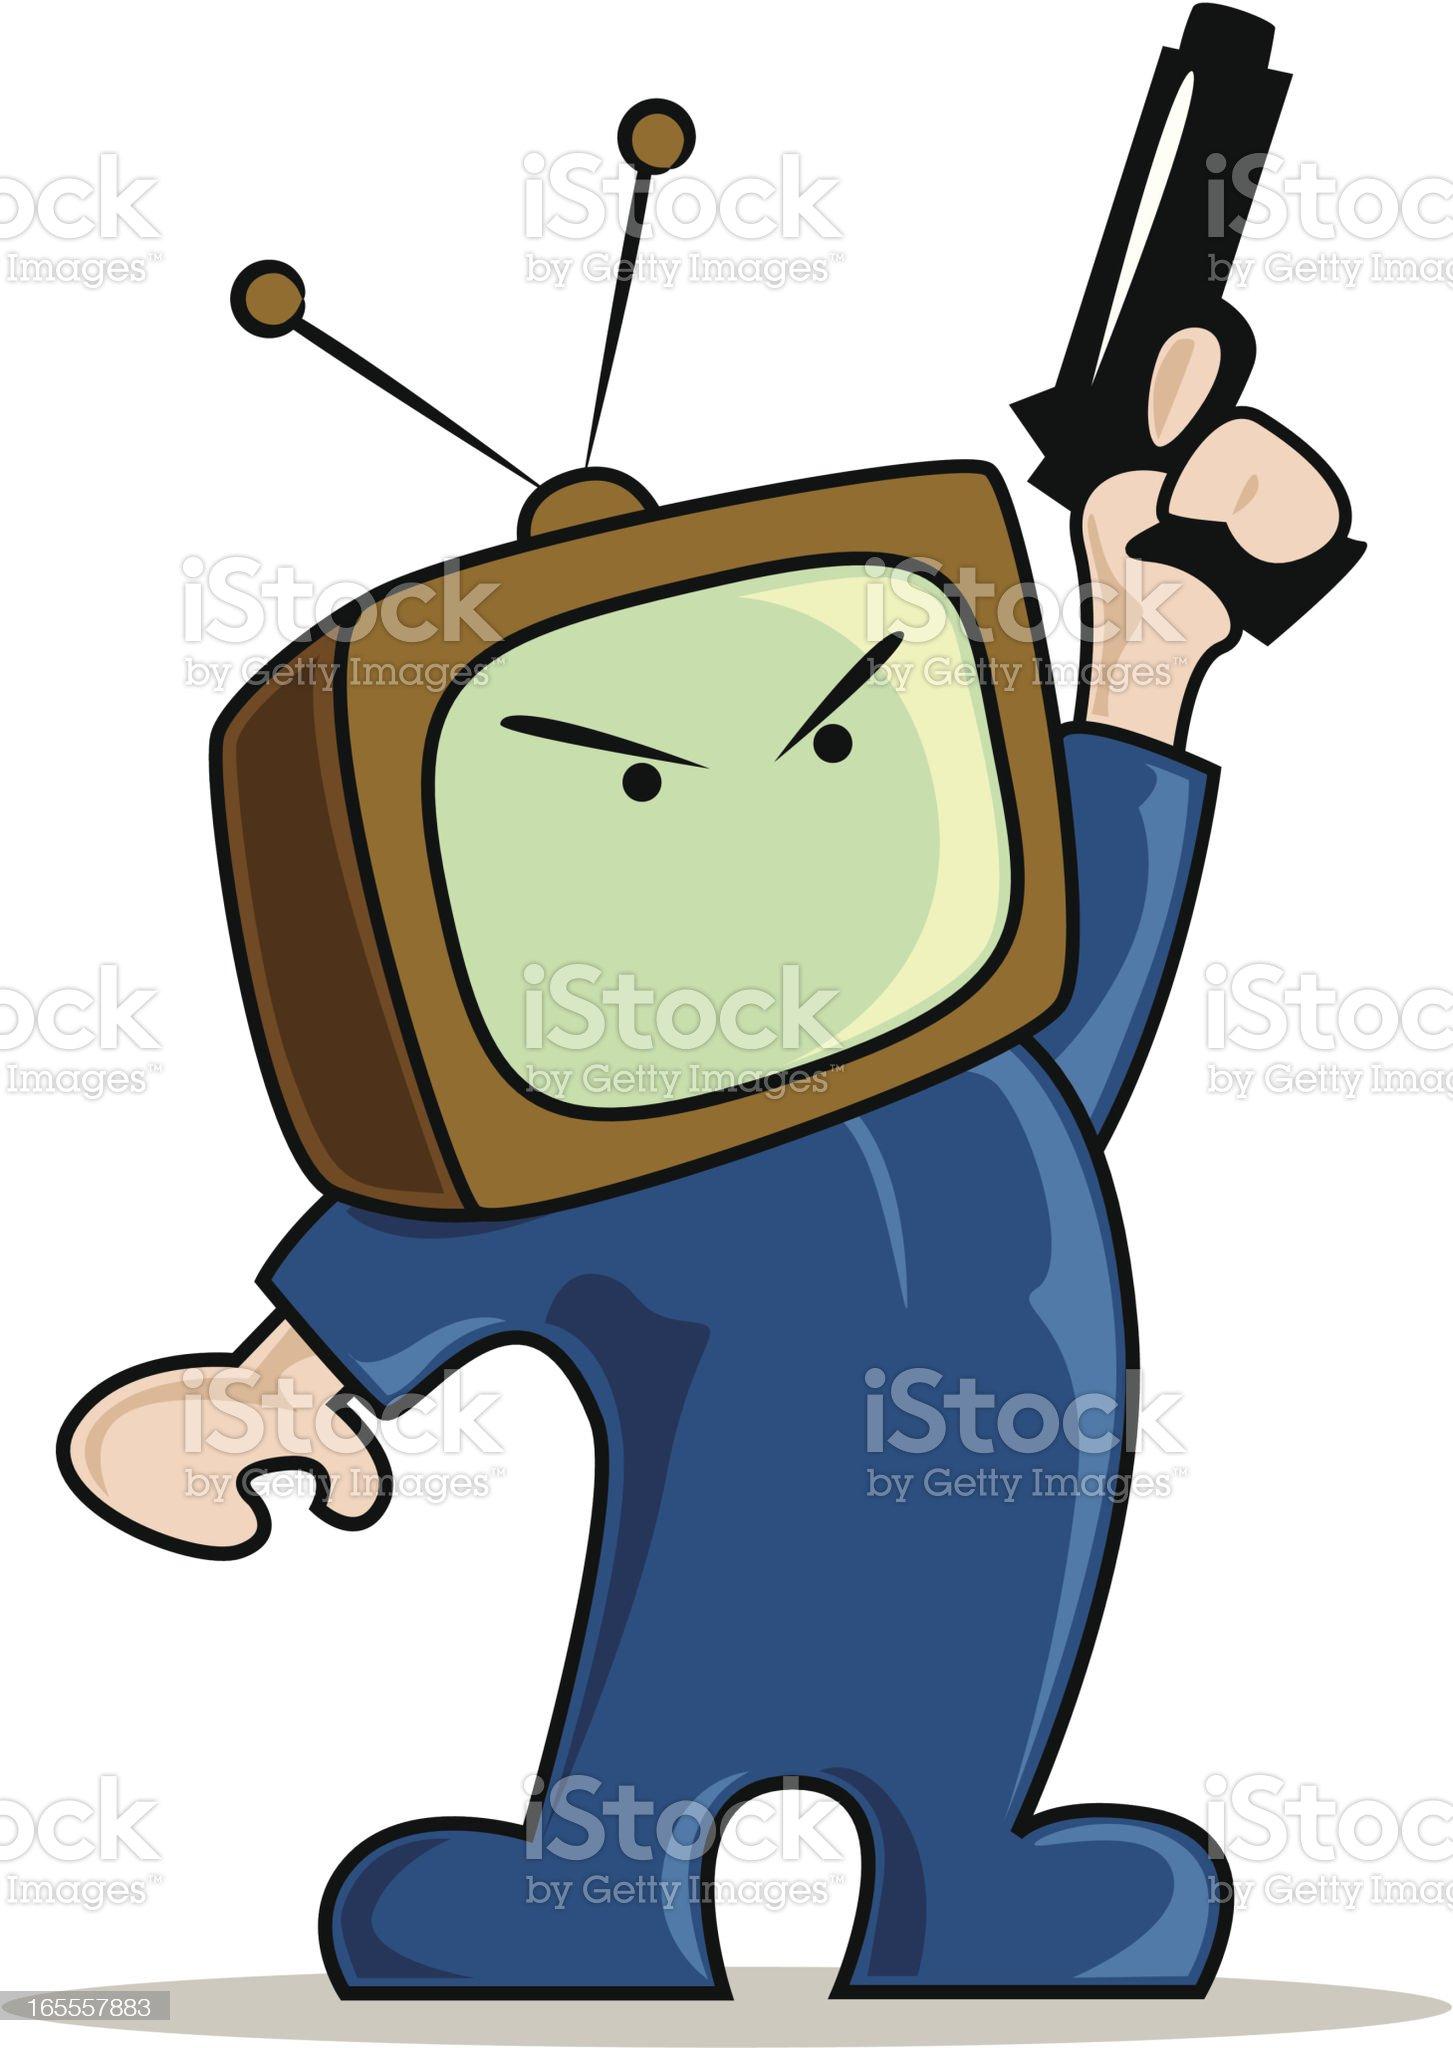 TV Violence Cartoon royalty-free stock vector art